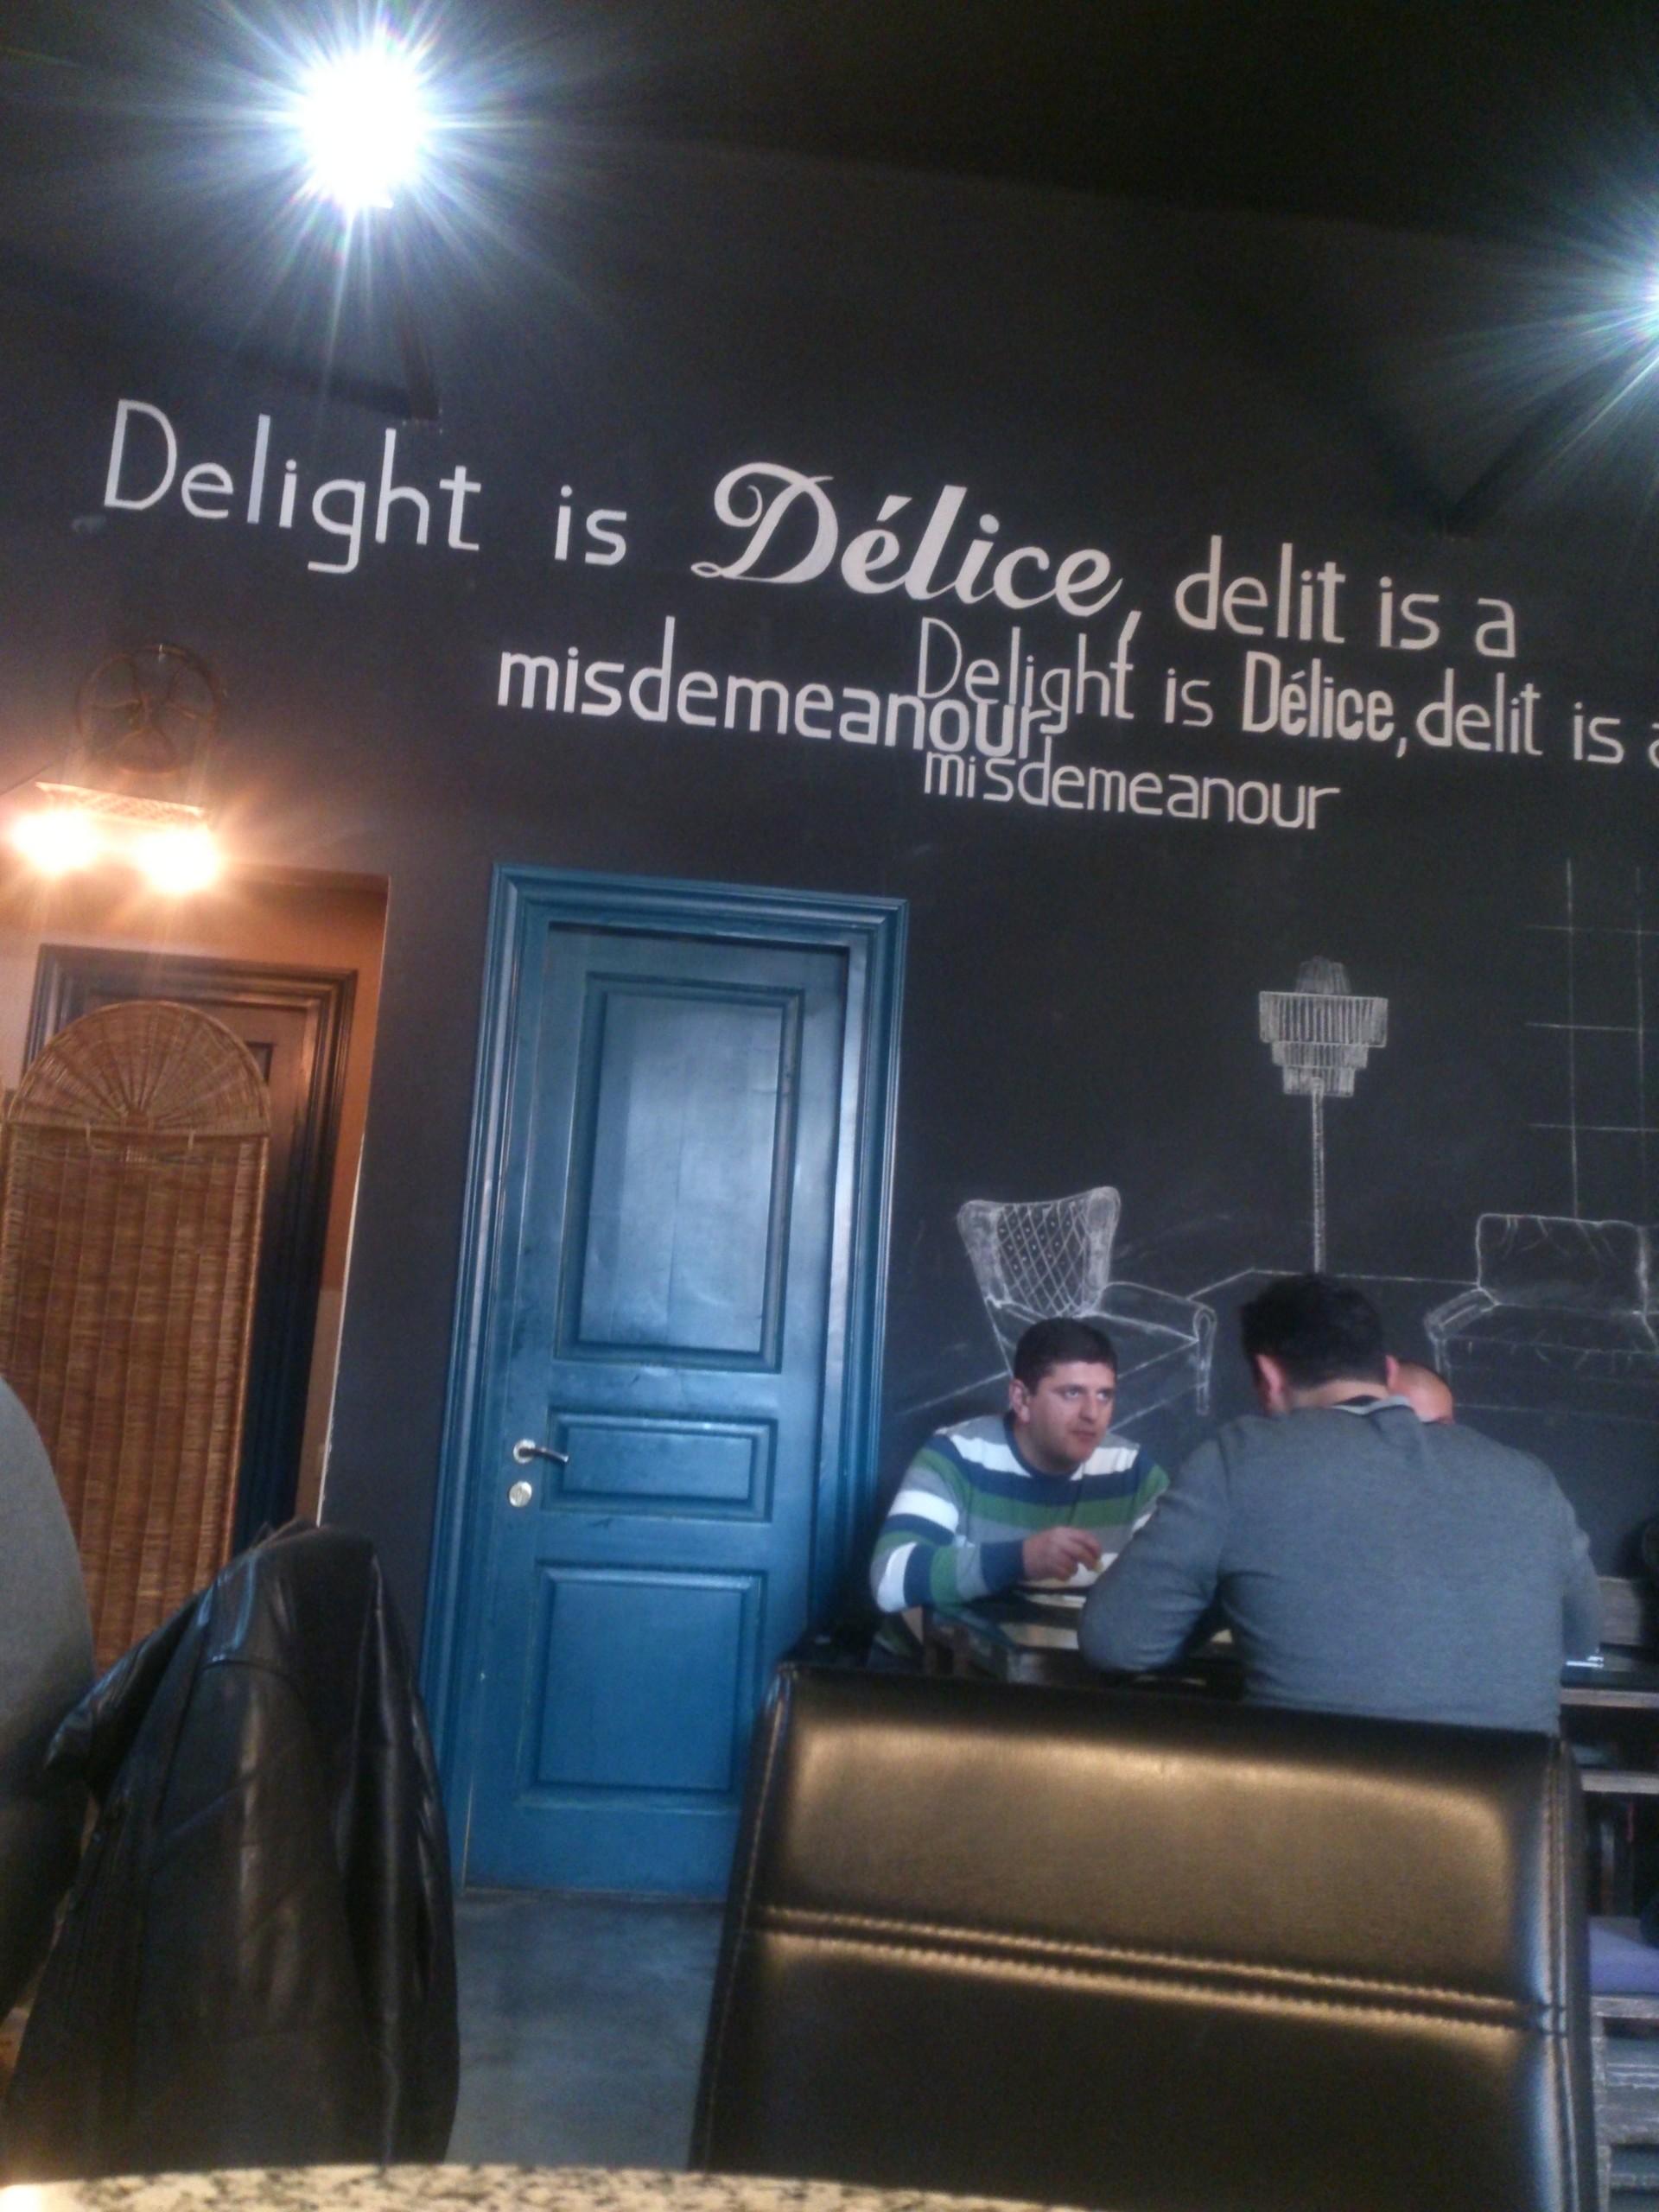 delight-delice-delit-misdemeanor-9276689